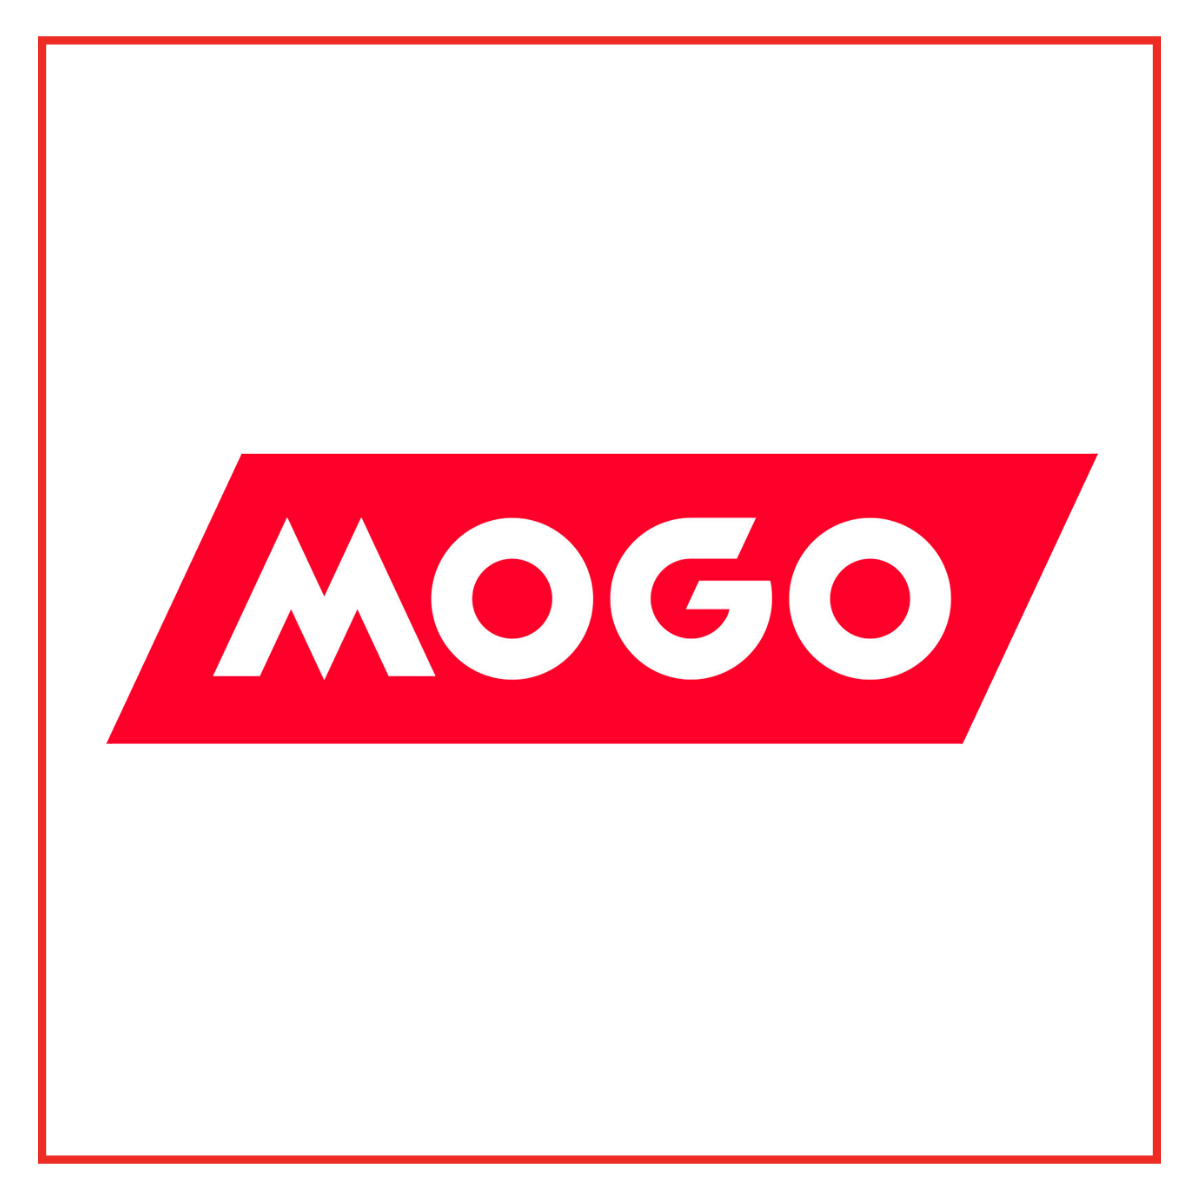 Mogo Acquires Moka in a 64-Million All-Stock Transaction